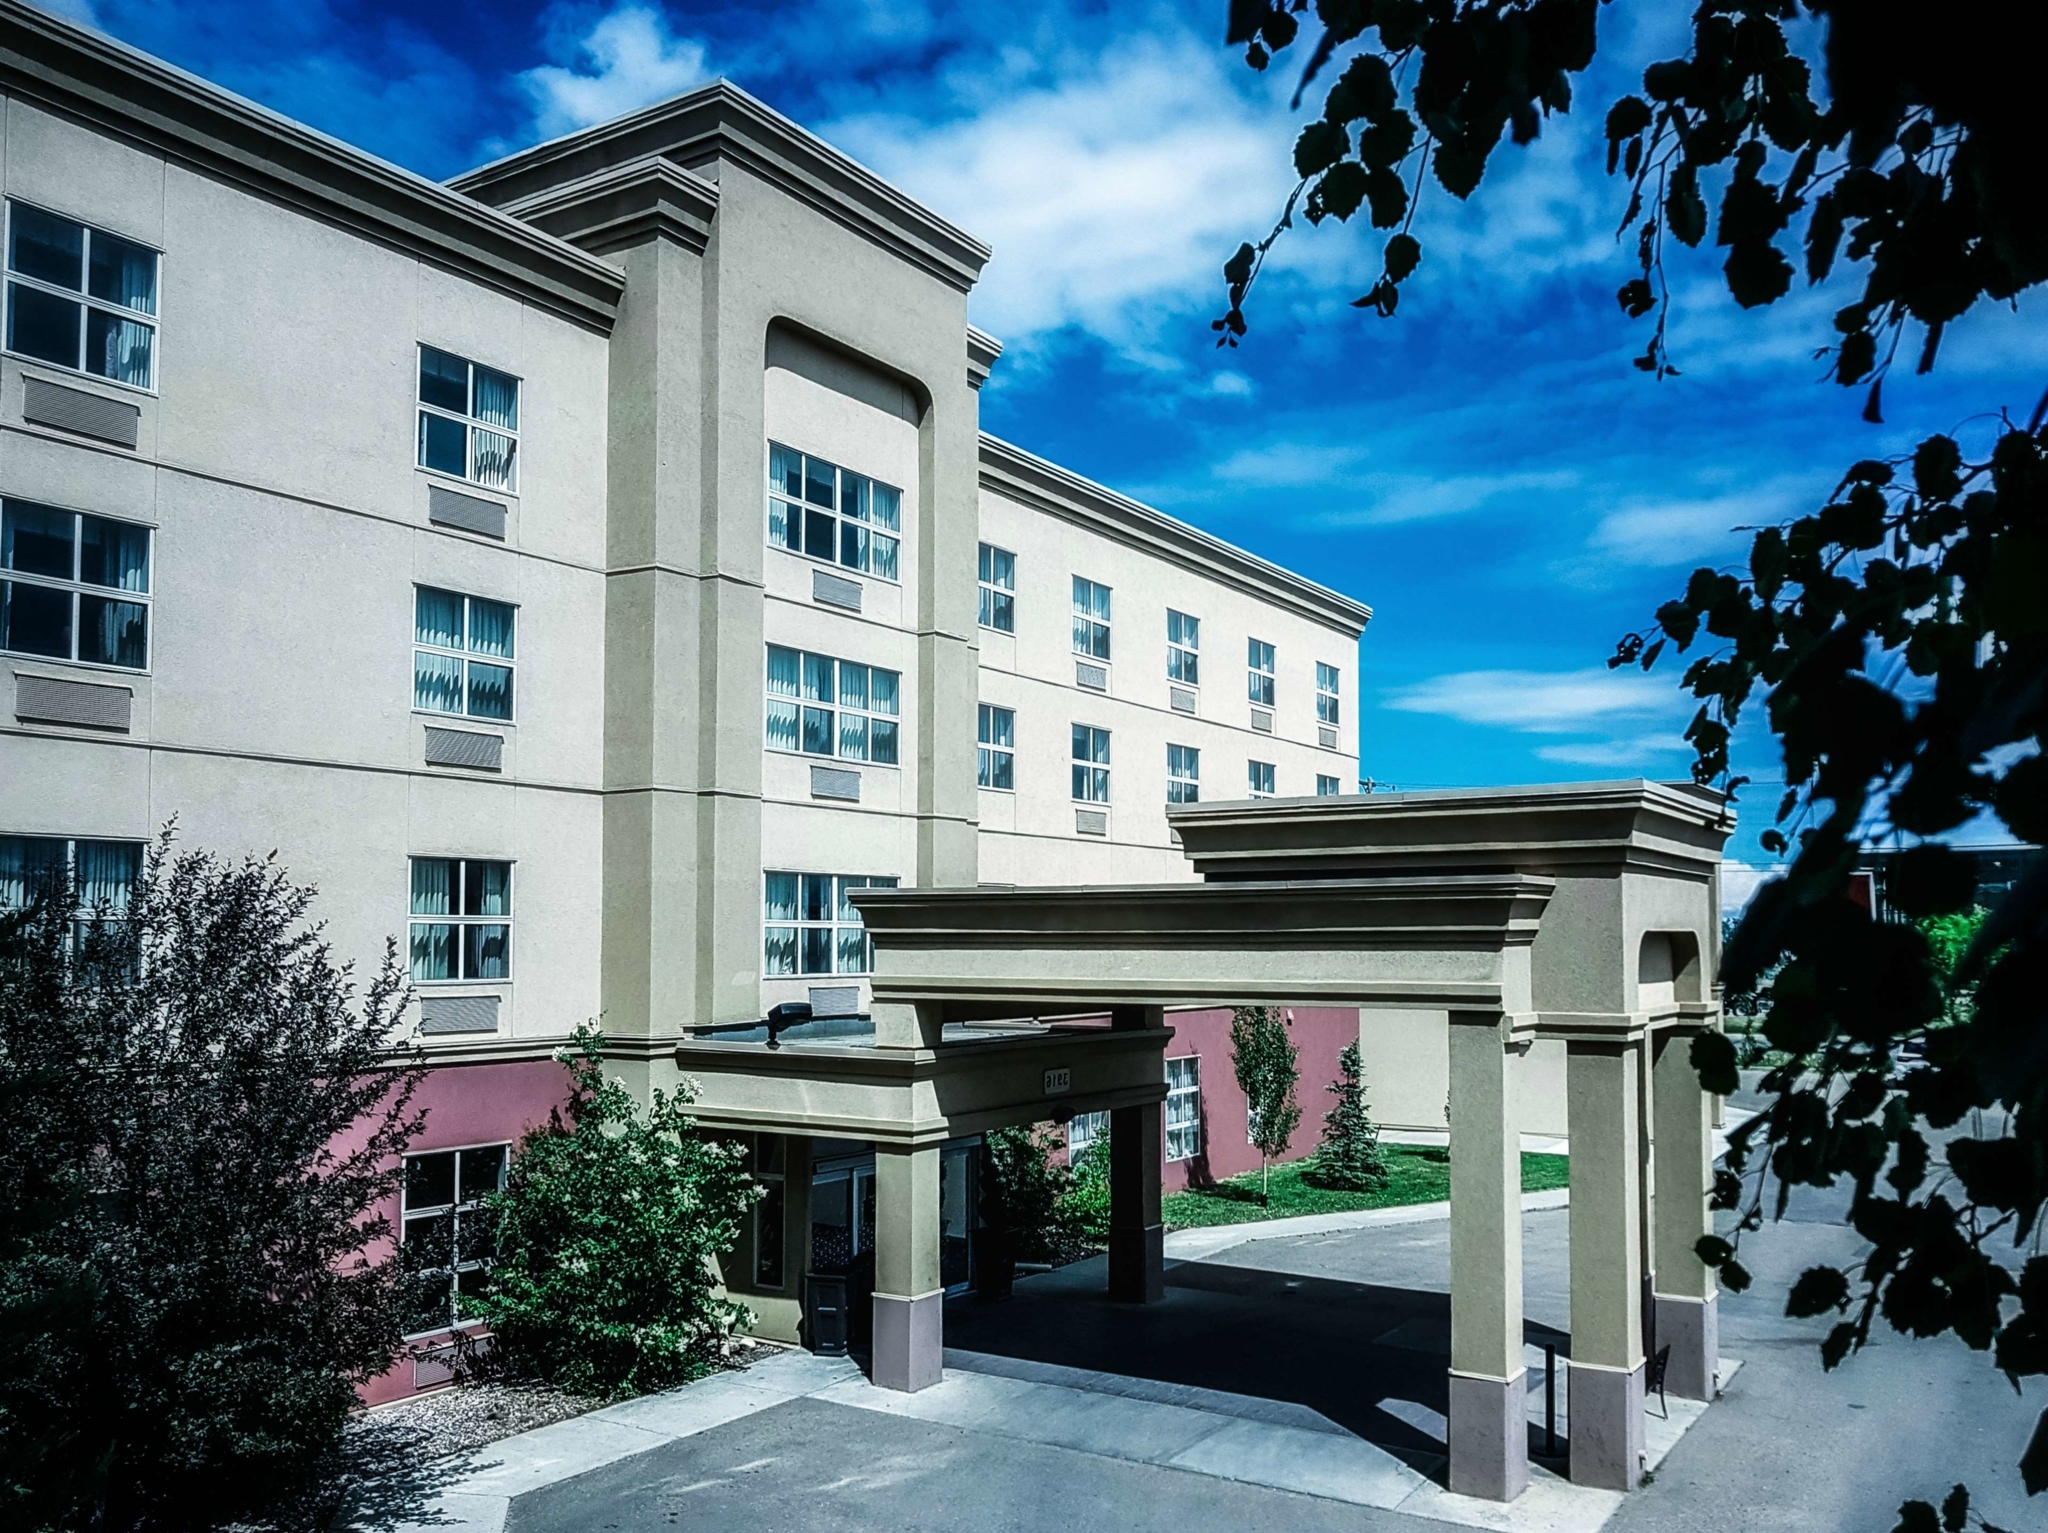 Hampton Inn & Suites by Hilton Edmonton International Airport - Hôtels